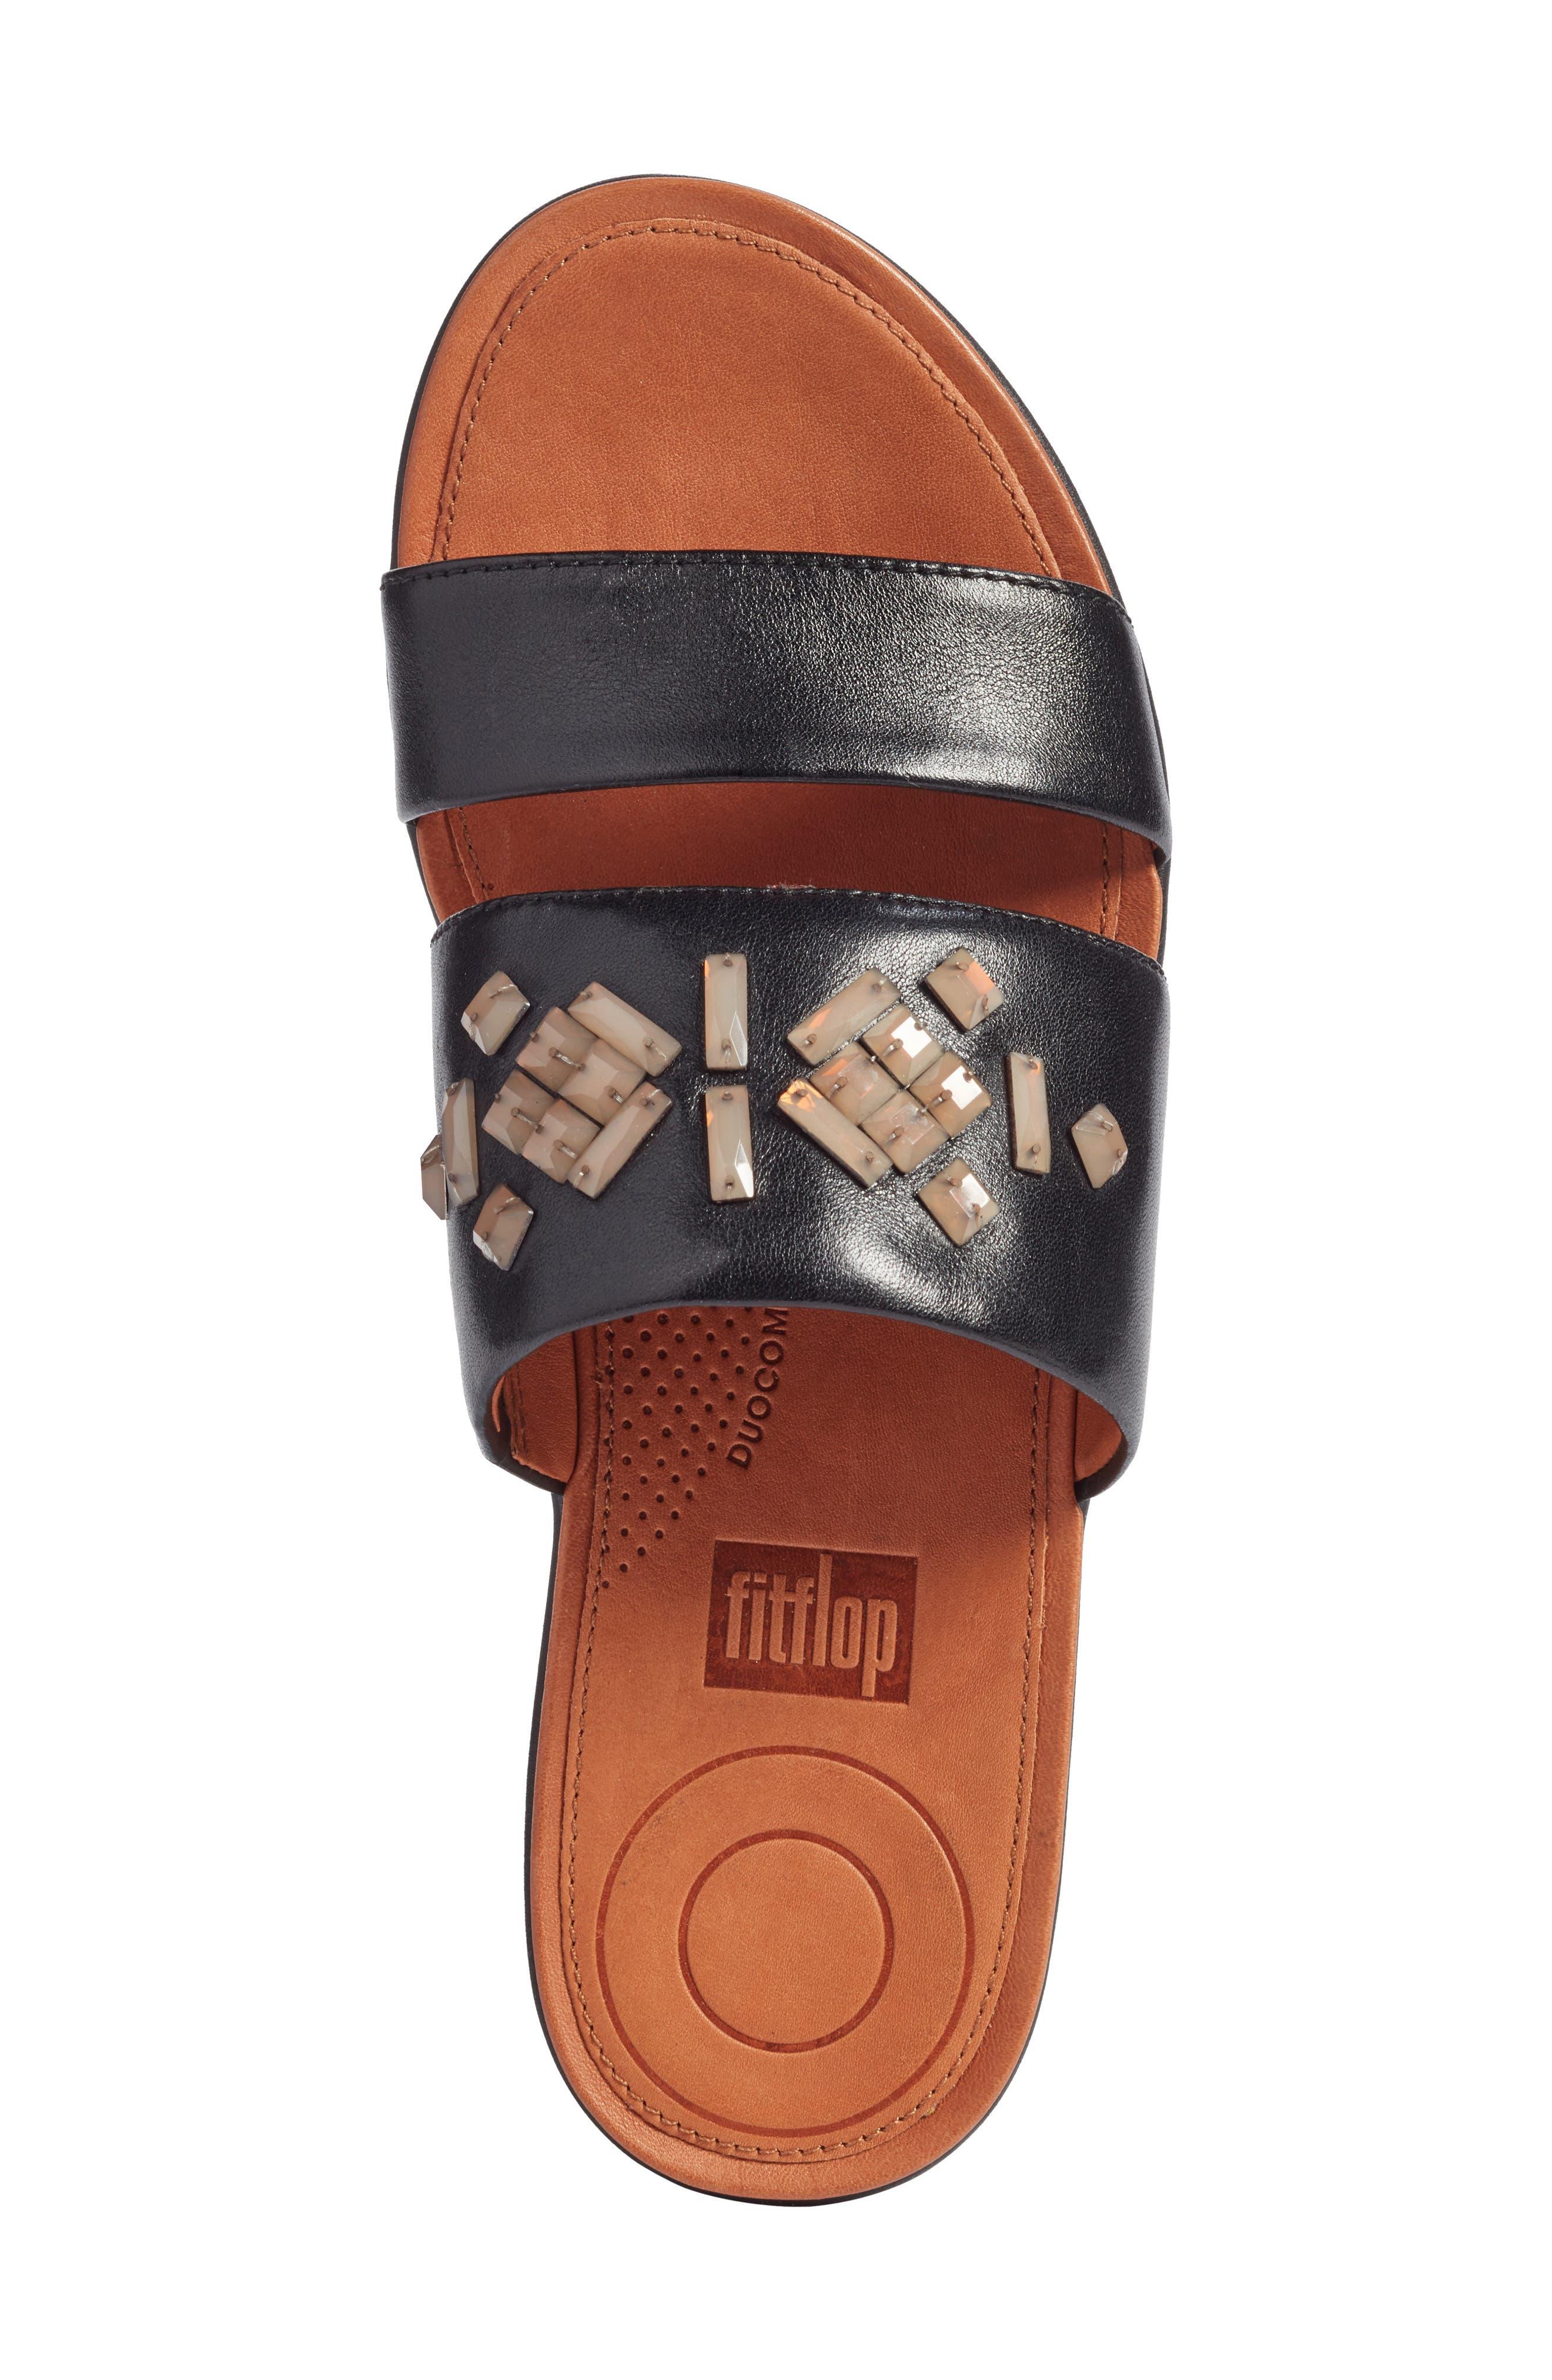 Delta Slide Sandal,                             Alternate thumbnail 5, color,                             BLACK LEATHER